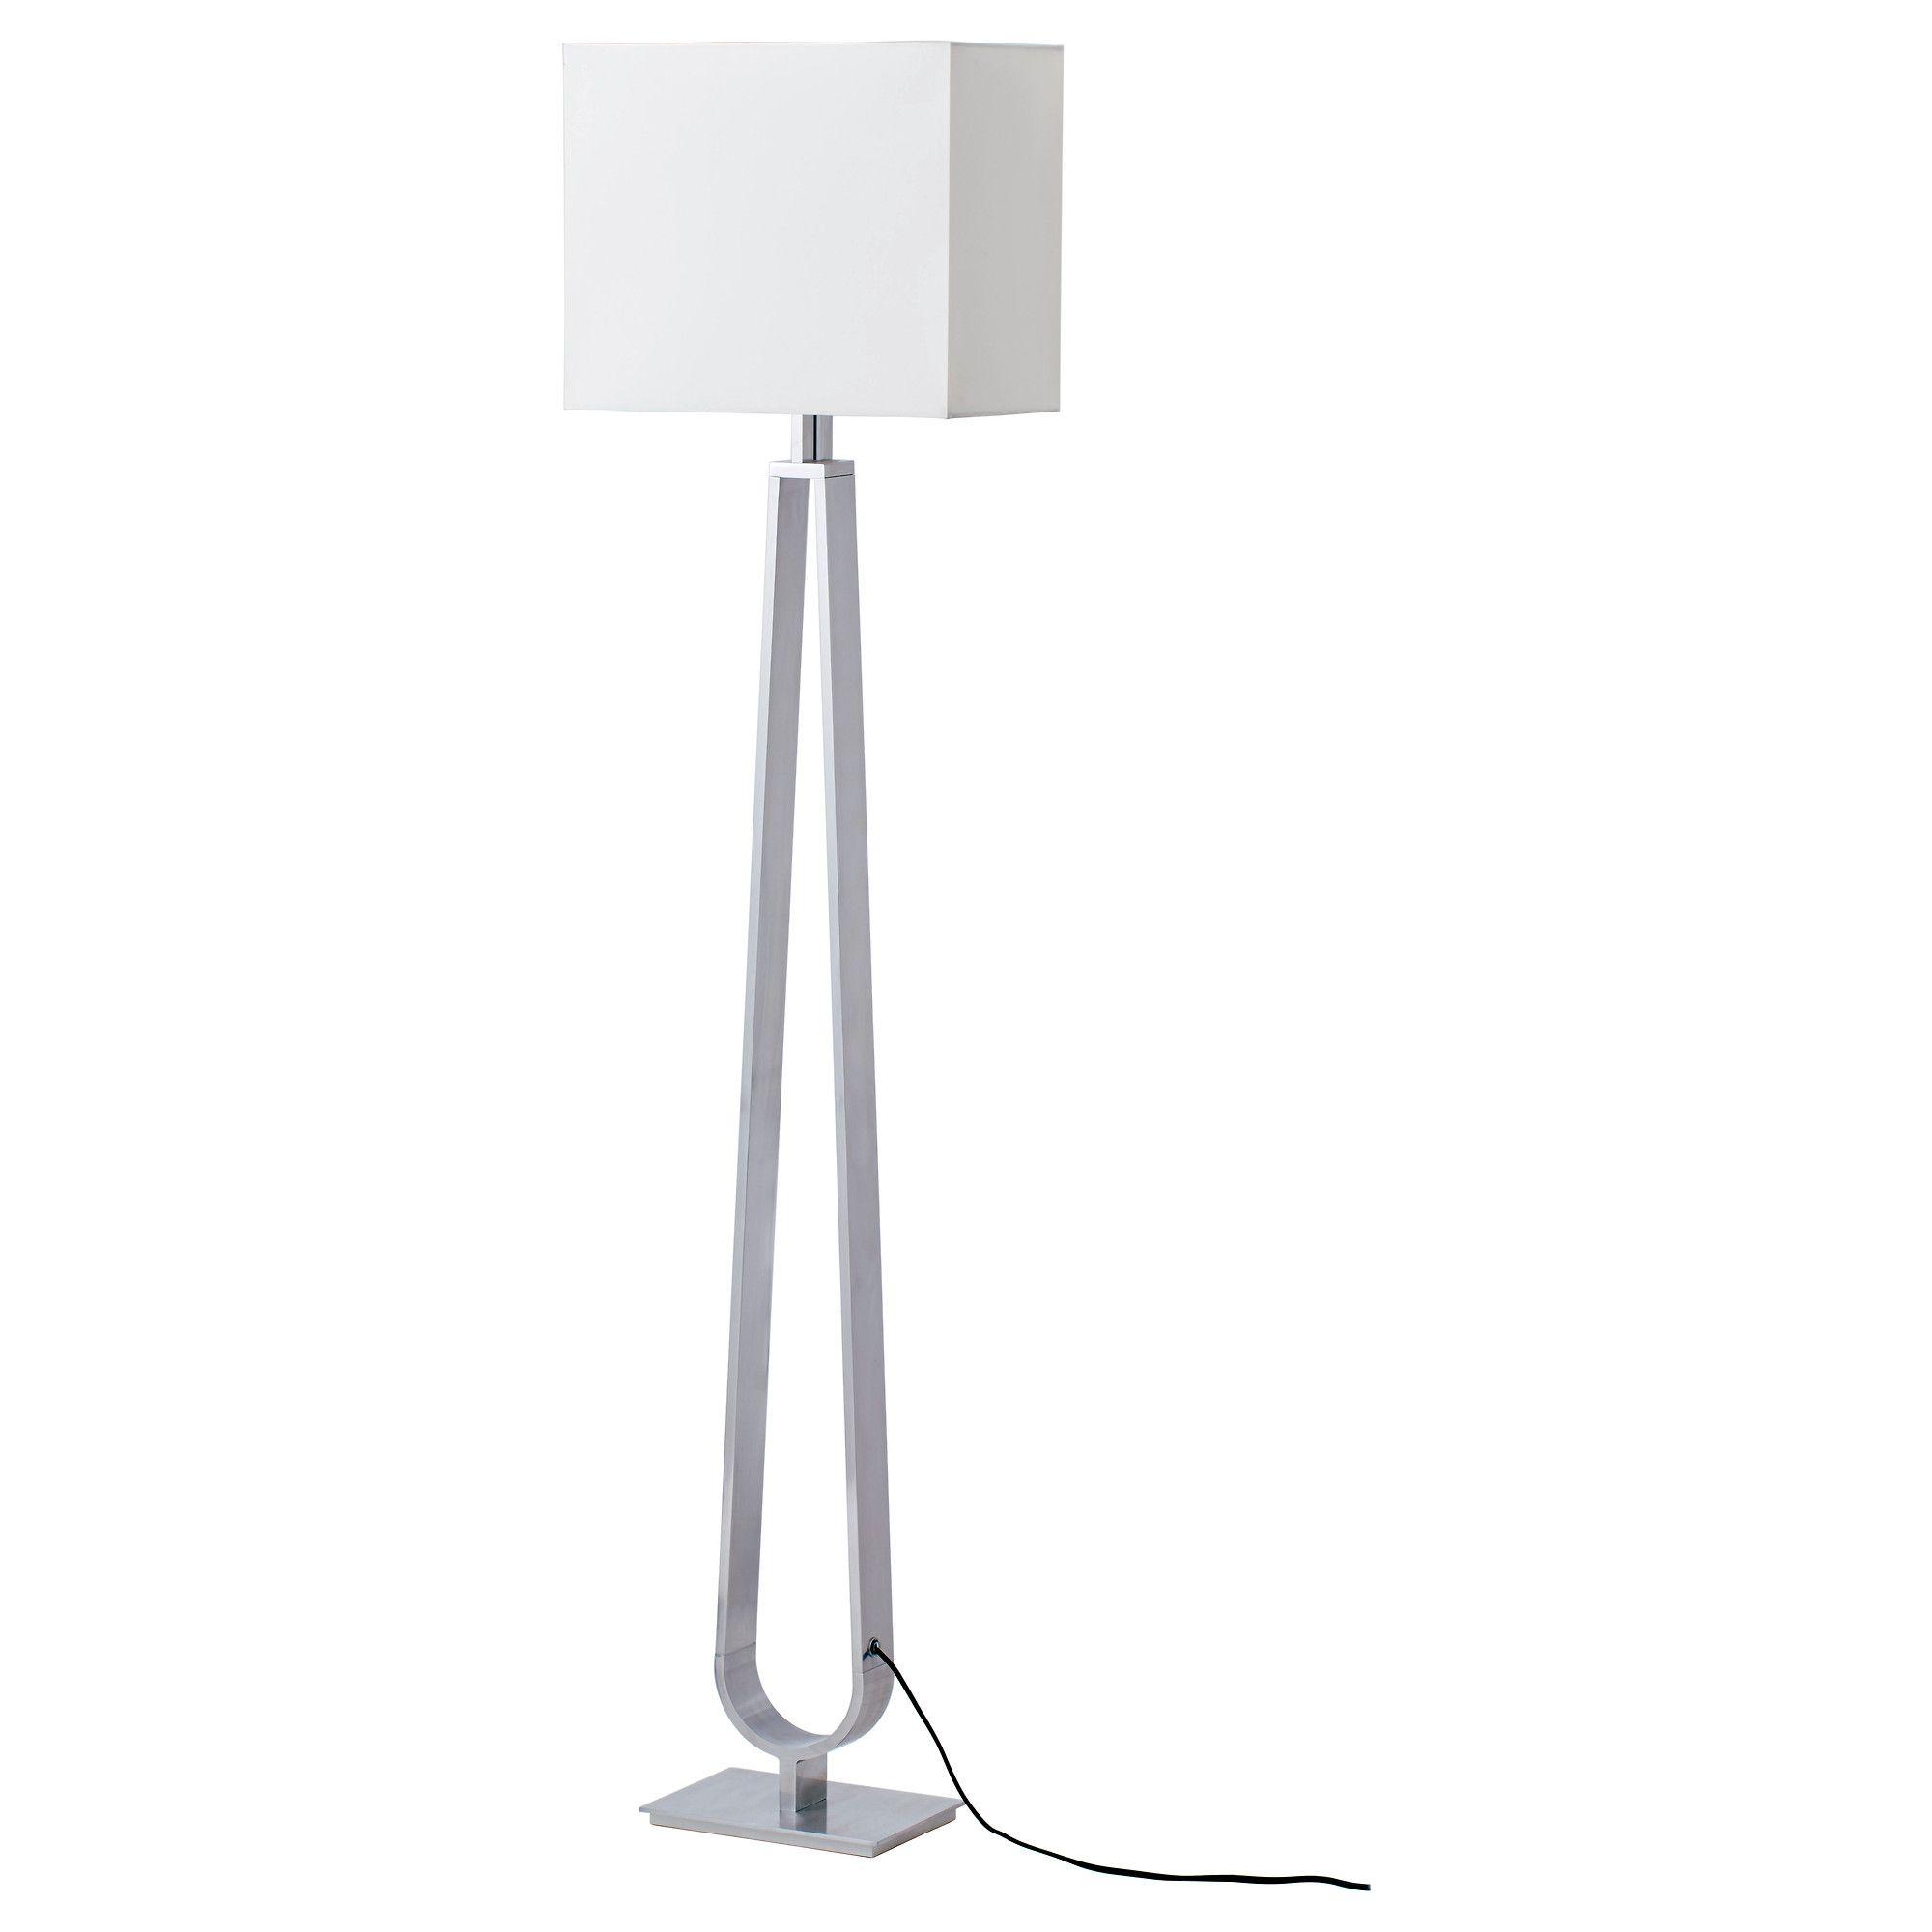 Ikea Klabb Floor Lamp Off White Lamps Ikea Floor Lamp White Floor Lamp Floor Lamp